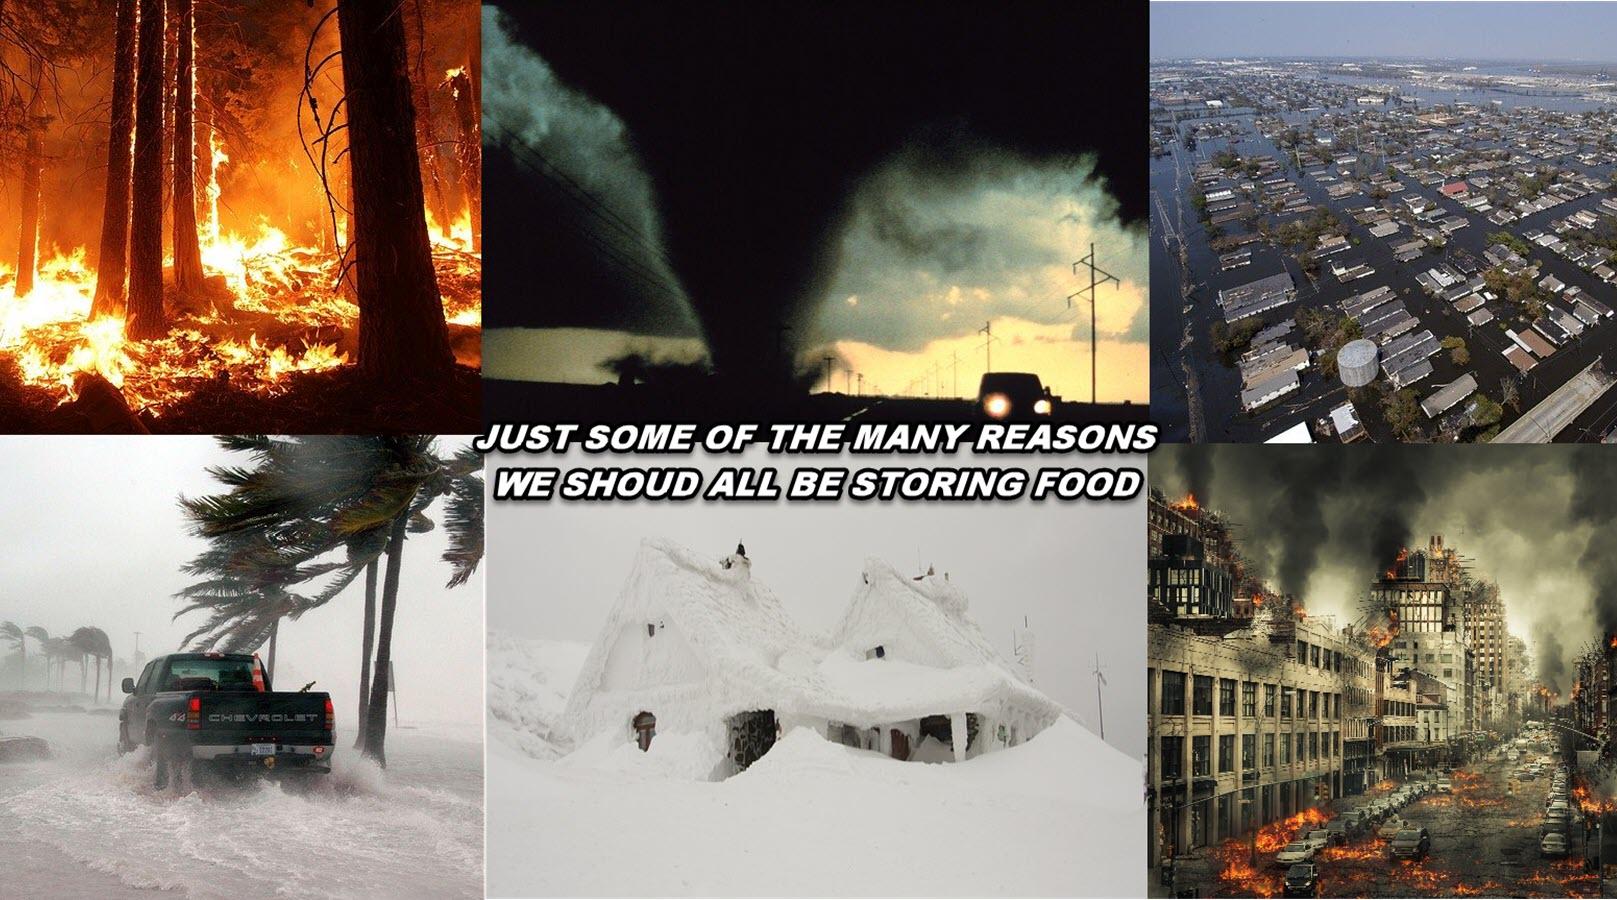 readywise-image-of-disasters1.jpg